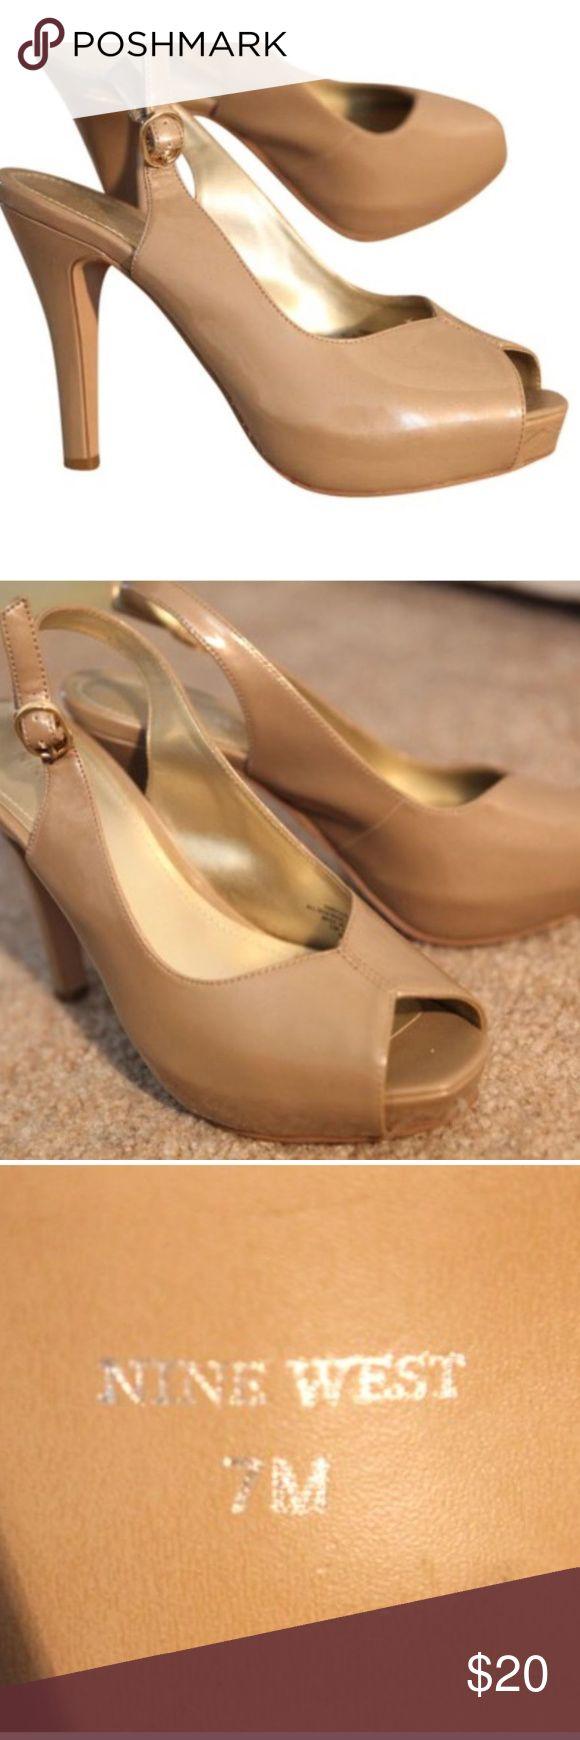 Nine West Tan Sling Back Pumps Nine West Tan Sling Back Pumps Size: US 7 Regular (M, B) Nine West Shoes Heels